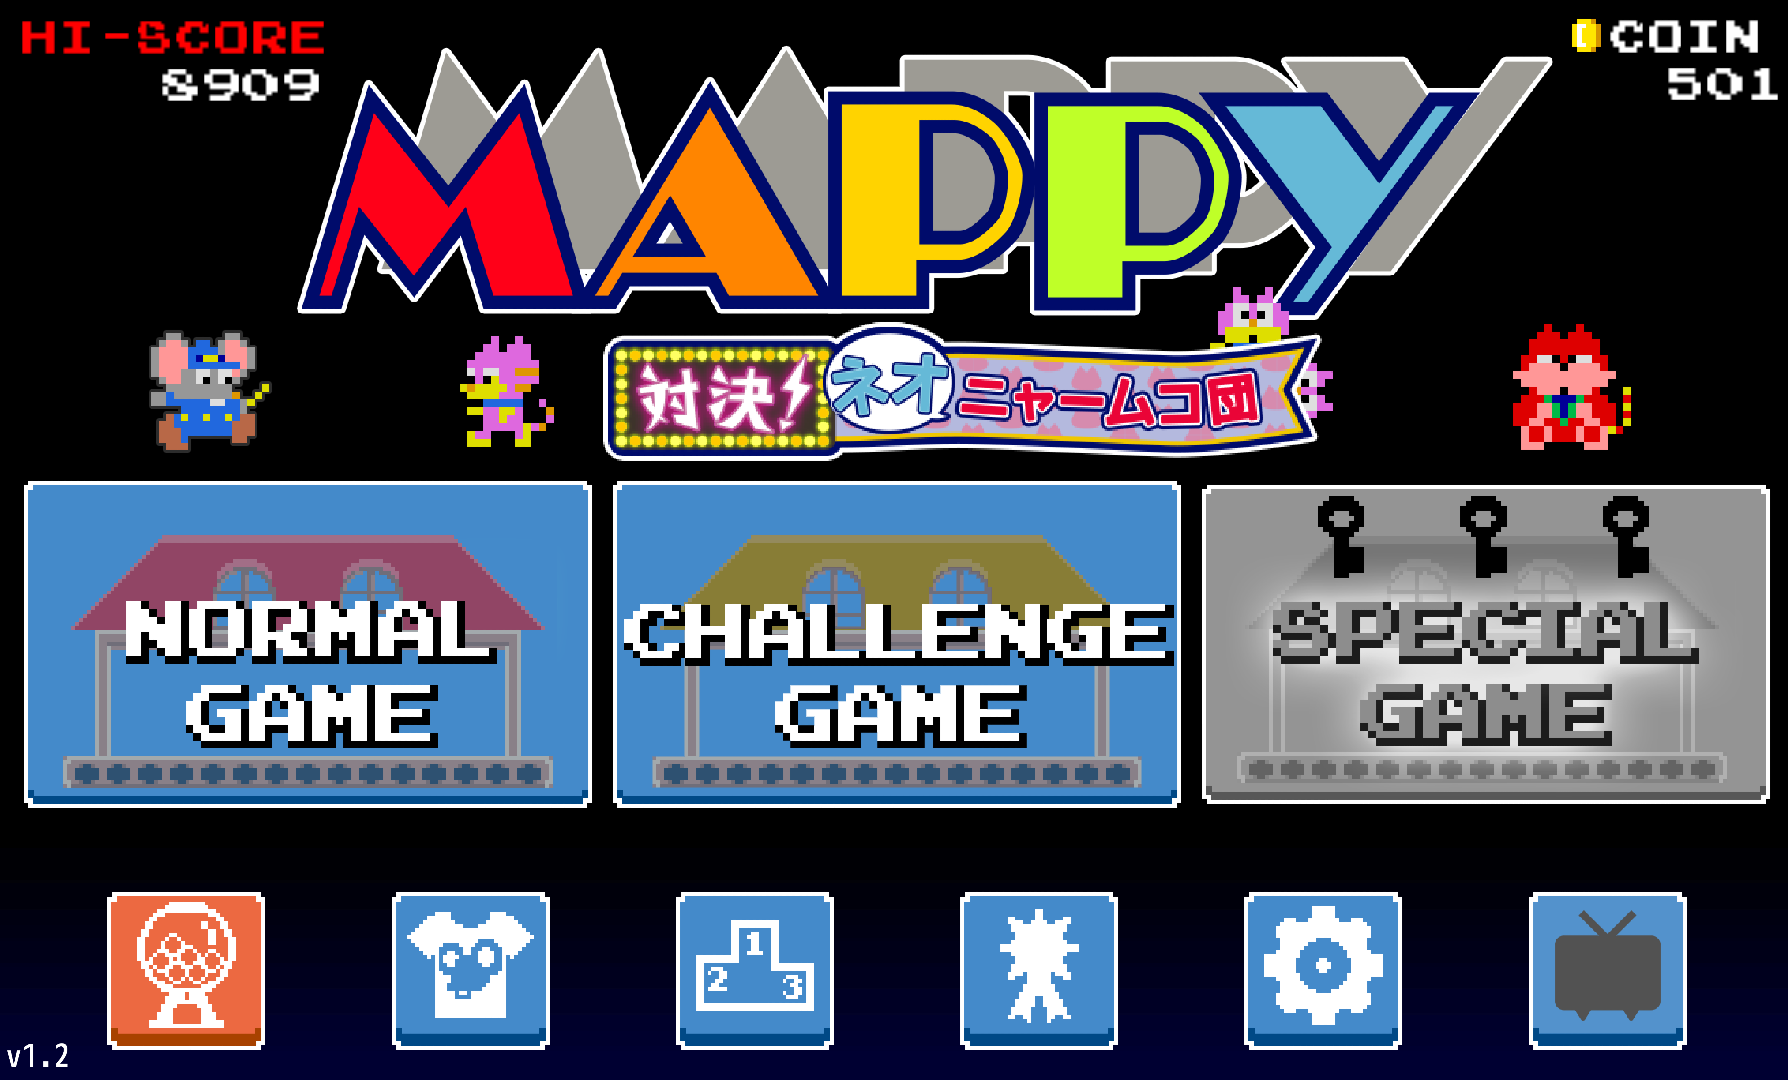 androidアプリ マッピー 対決!ネオニャームコ団攻略スクリーンショット1